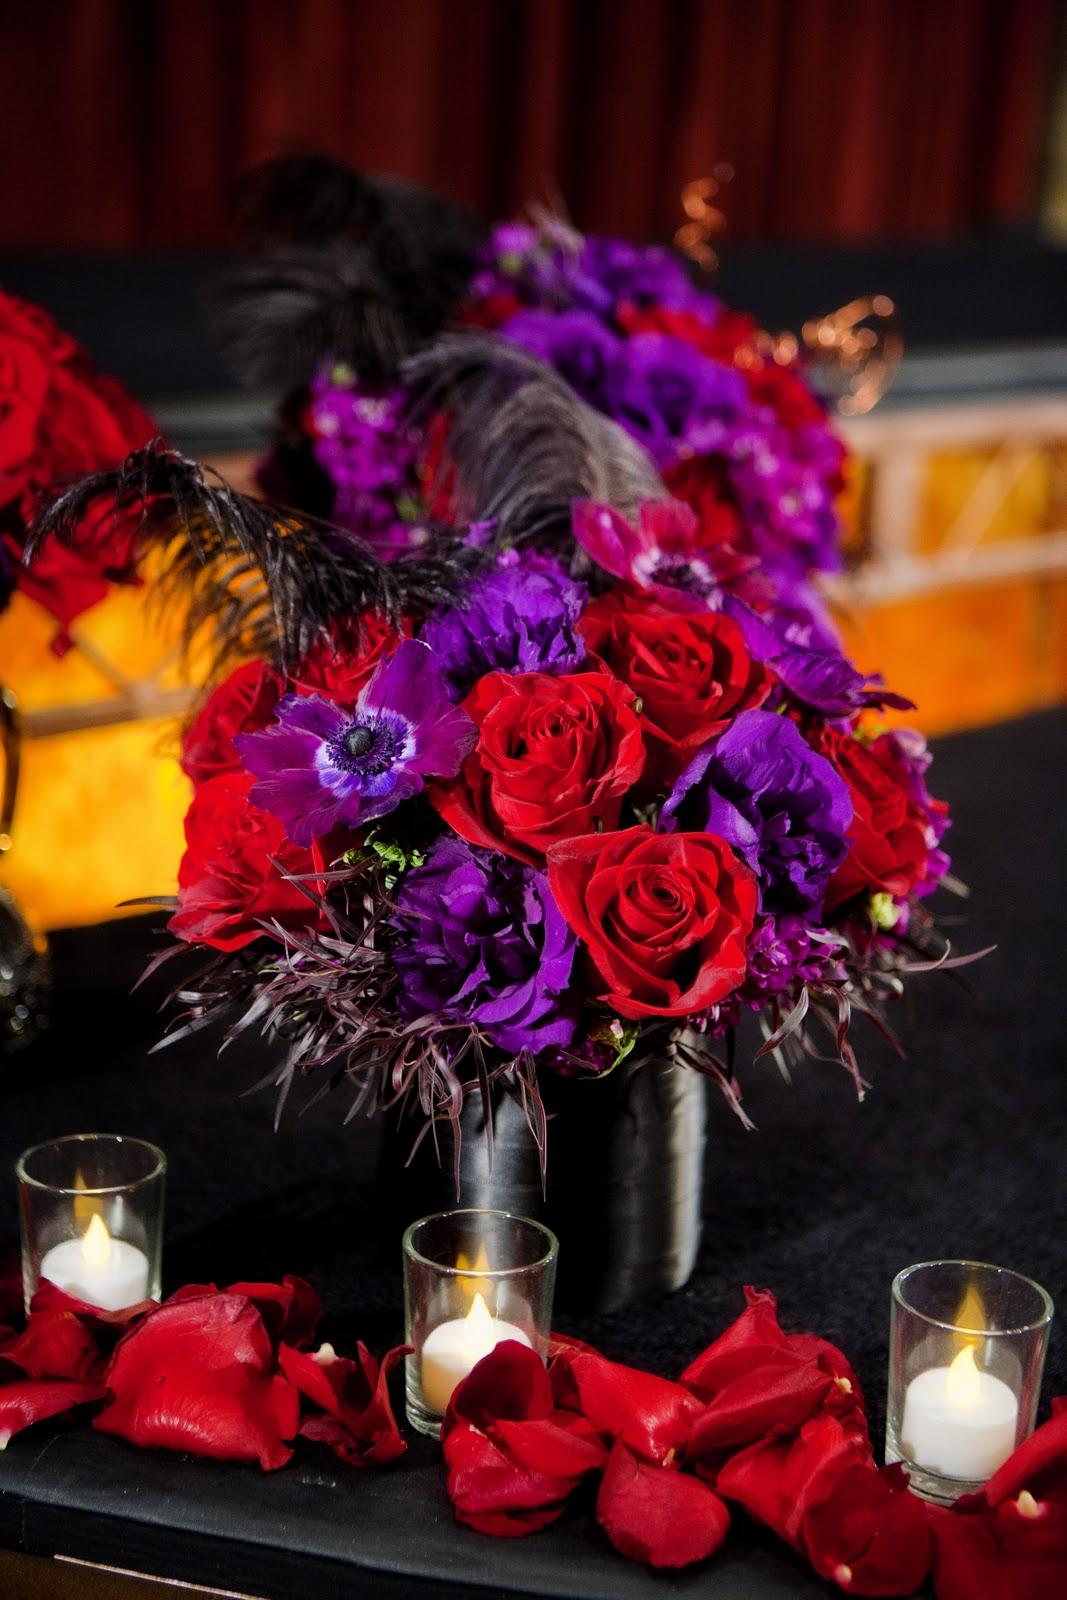 sTORIbook Weddings  Shabby Chic at Calamigos Ranch in Malibu and SteamPunk Wedding at The